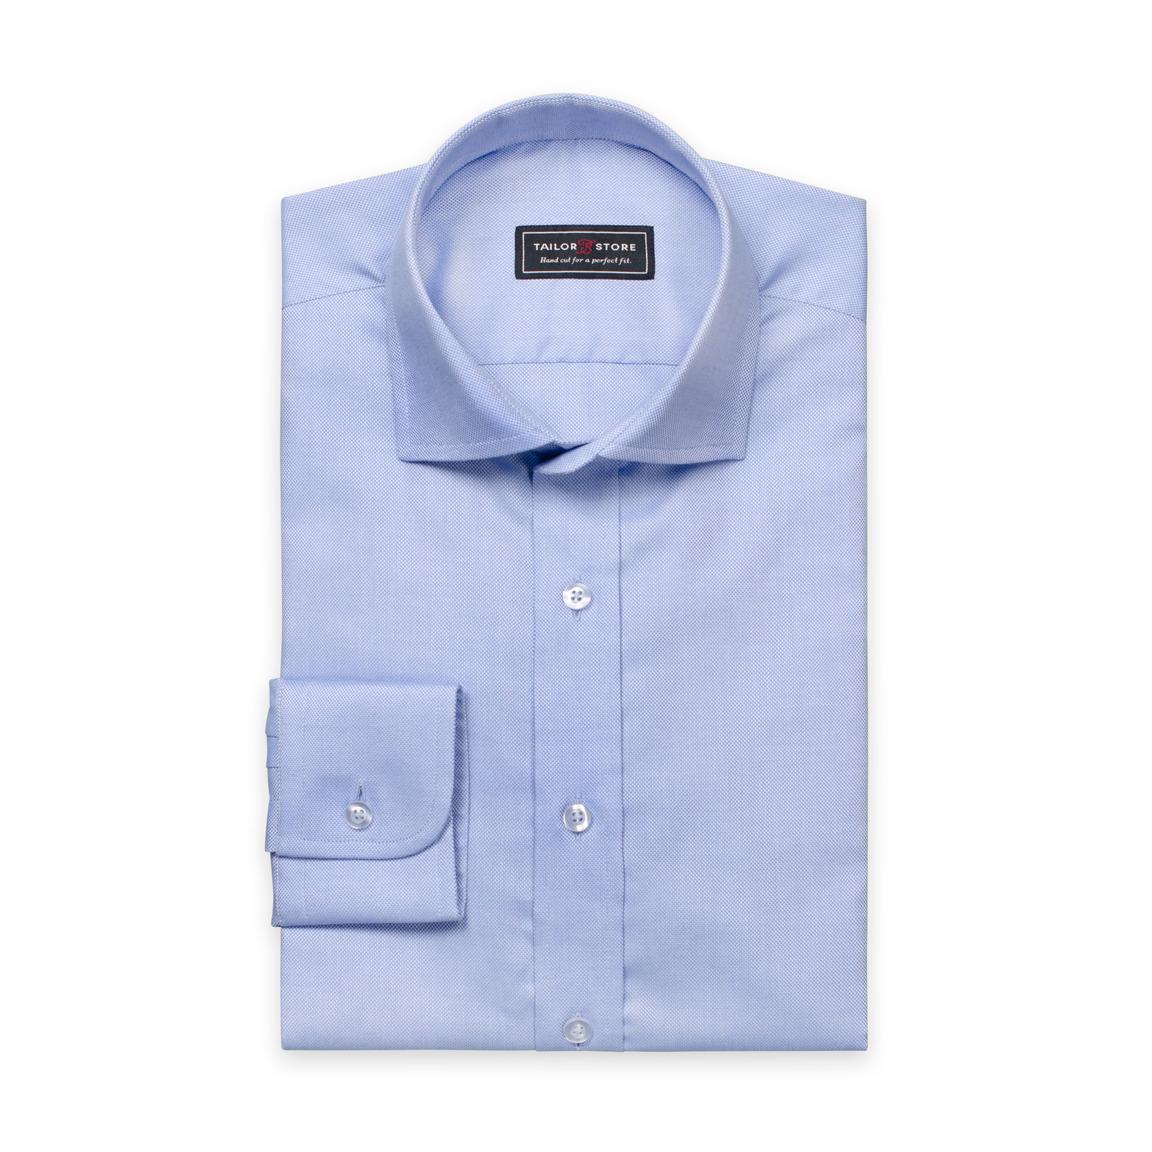 Blå Oxford cut away classic-skjorte